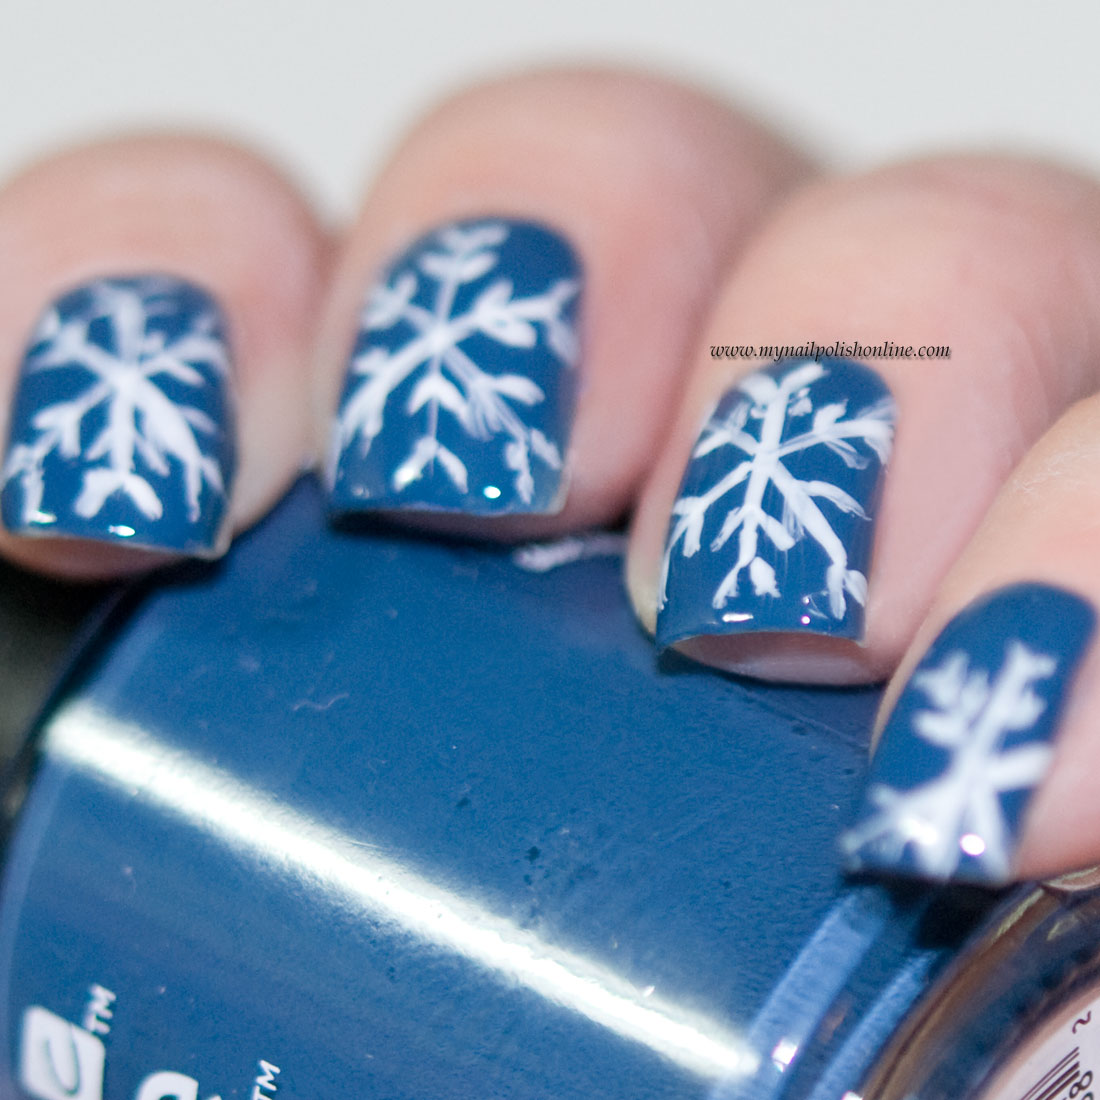 Snowflakes on nails